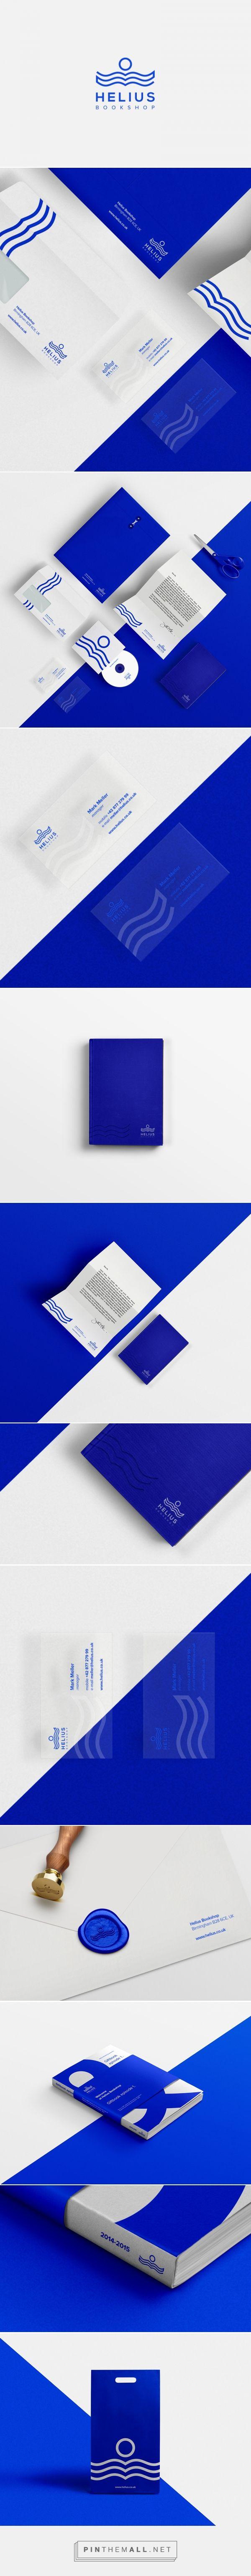 Helius bookshop on Behance   Fivestar Branding – Design and Branding Agency & Inspiration Gallery